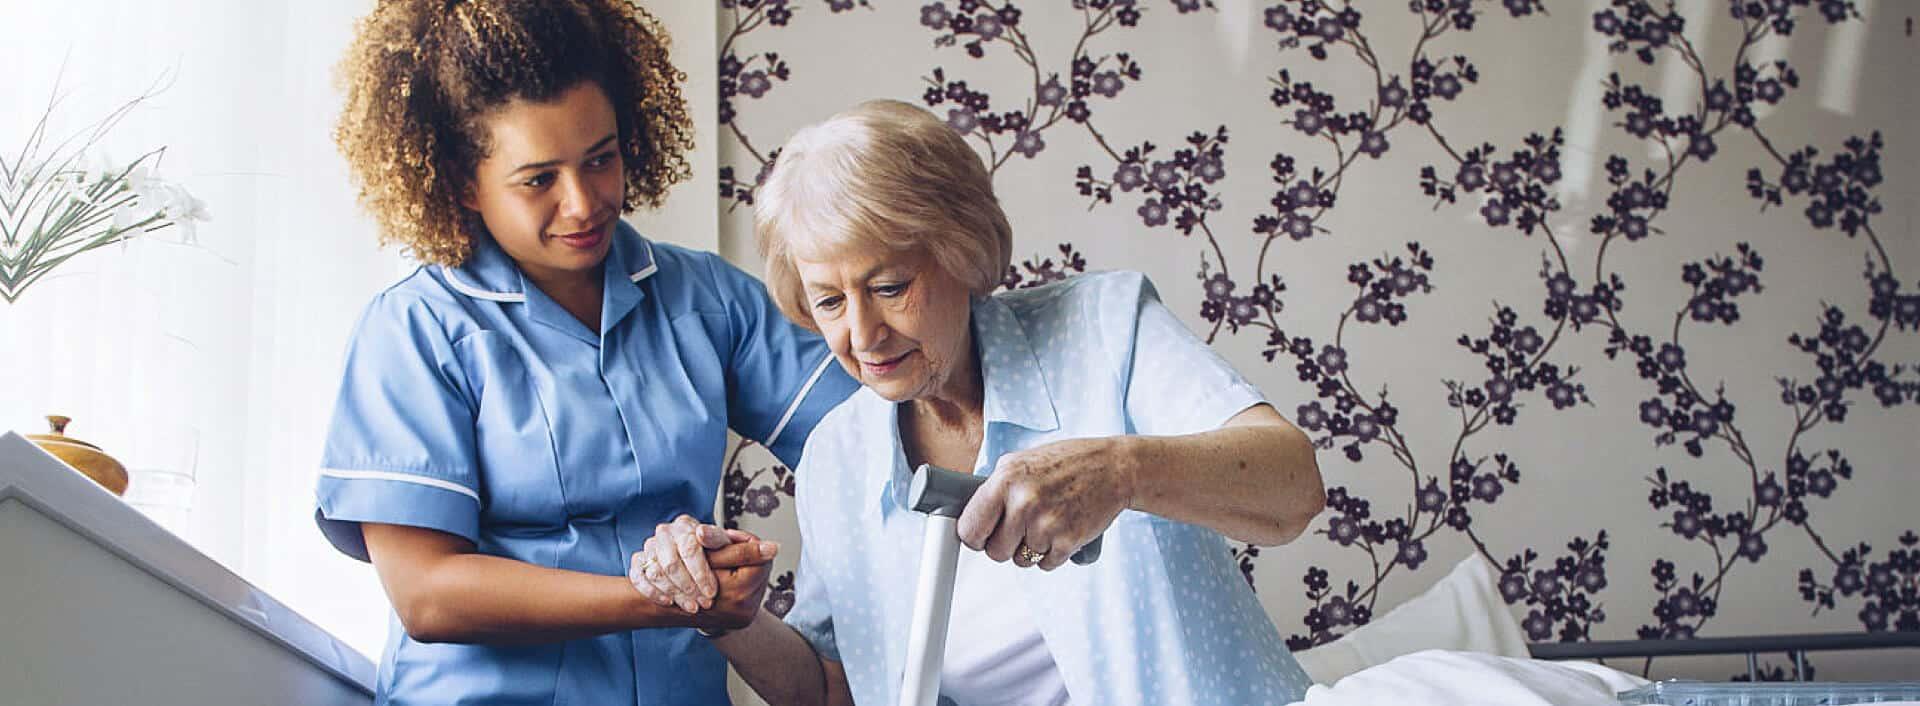 caregiver caring senior woman